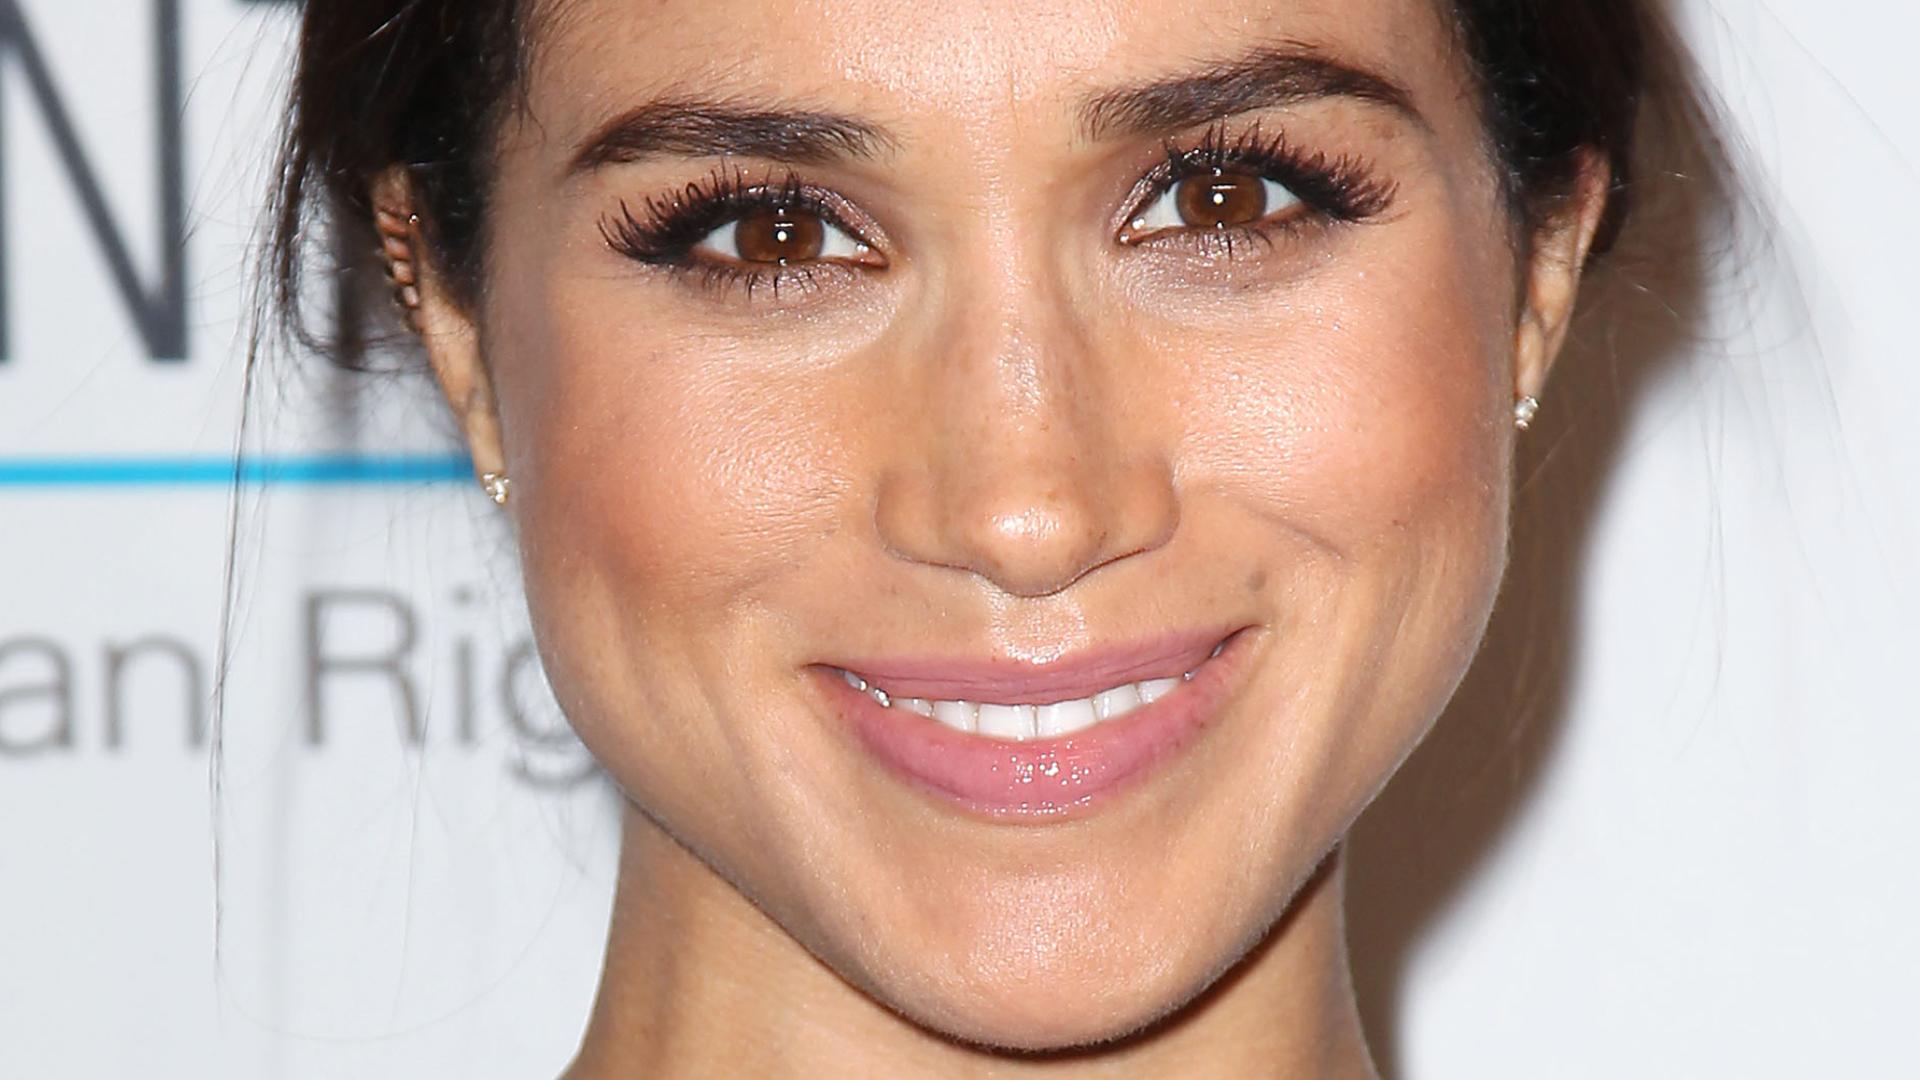 Megan wearing faux mink lashes